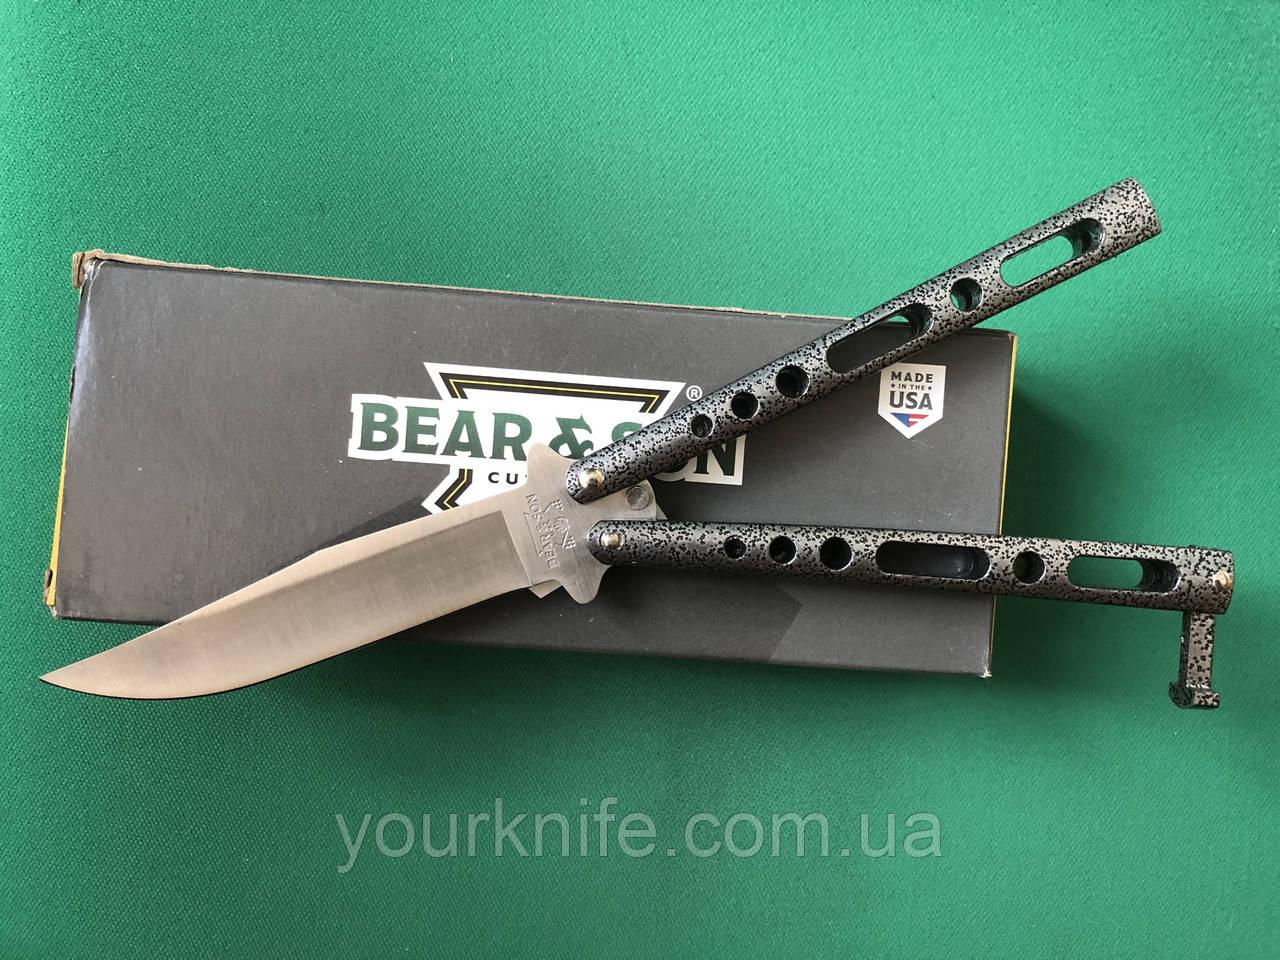 Купить со скидкой Нож Bear & Son Balisong silver